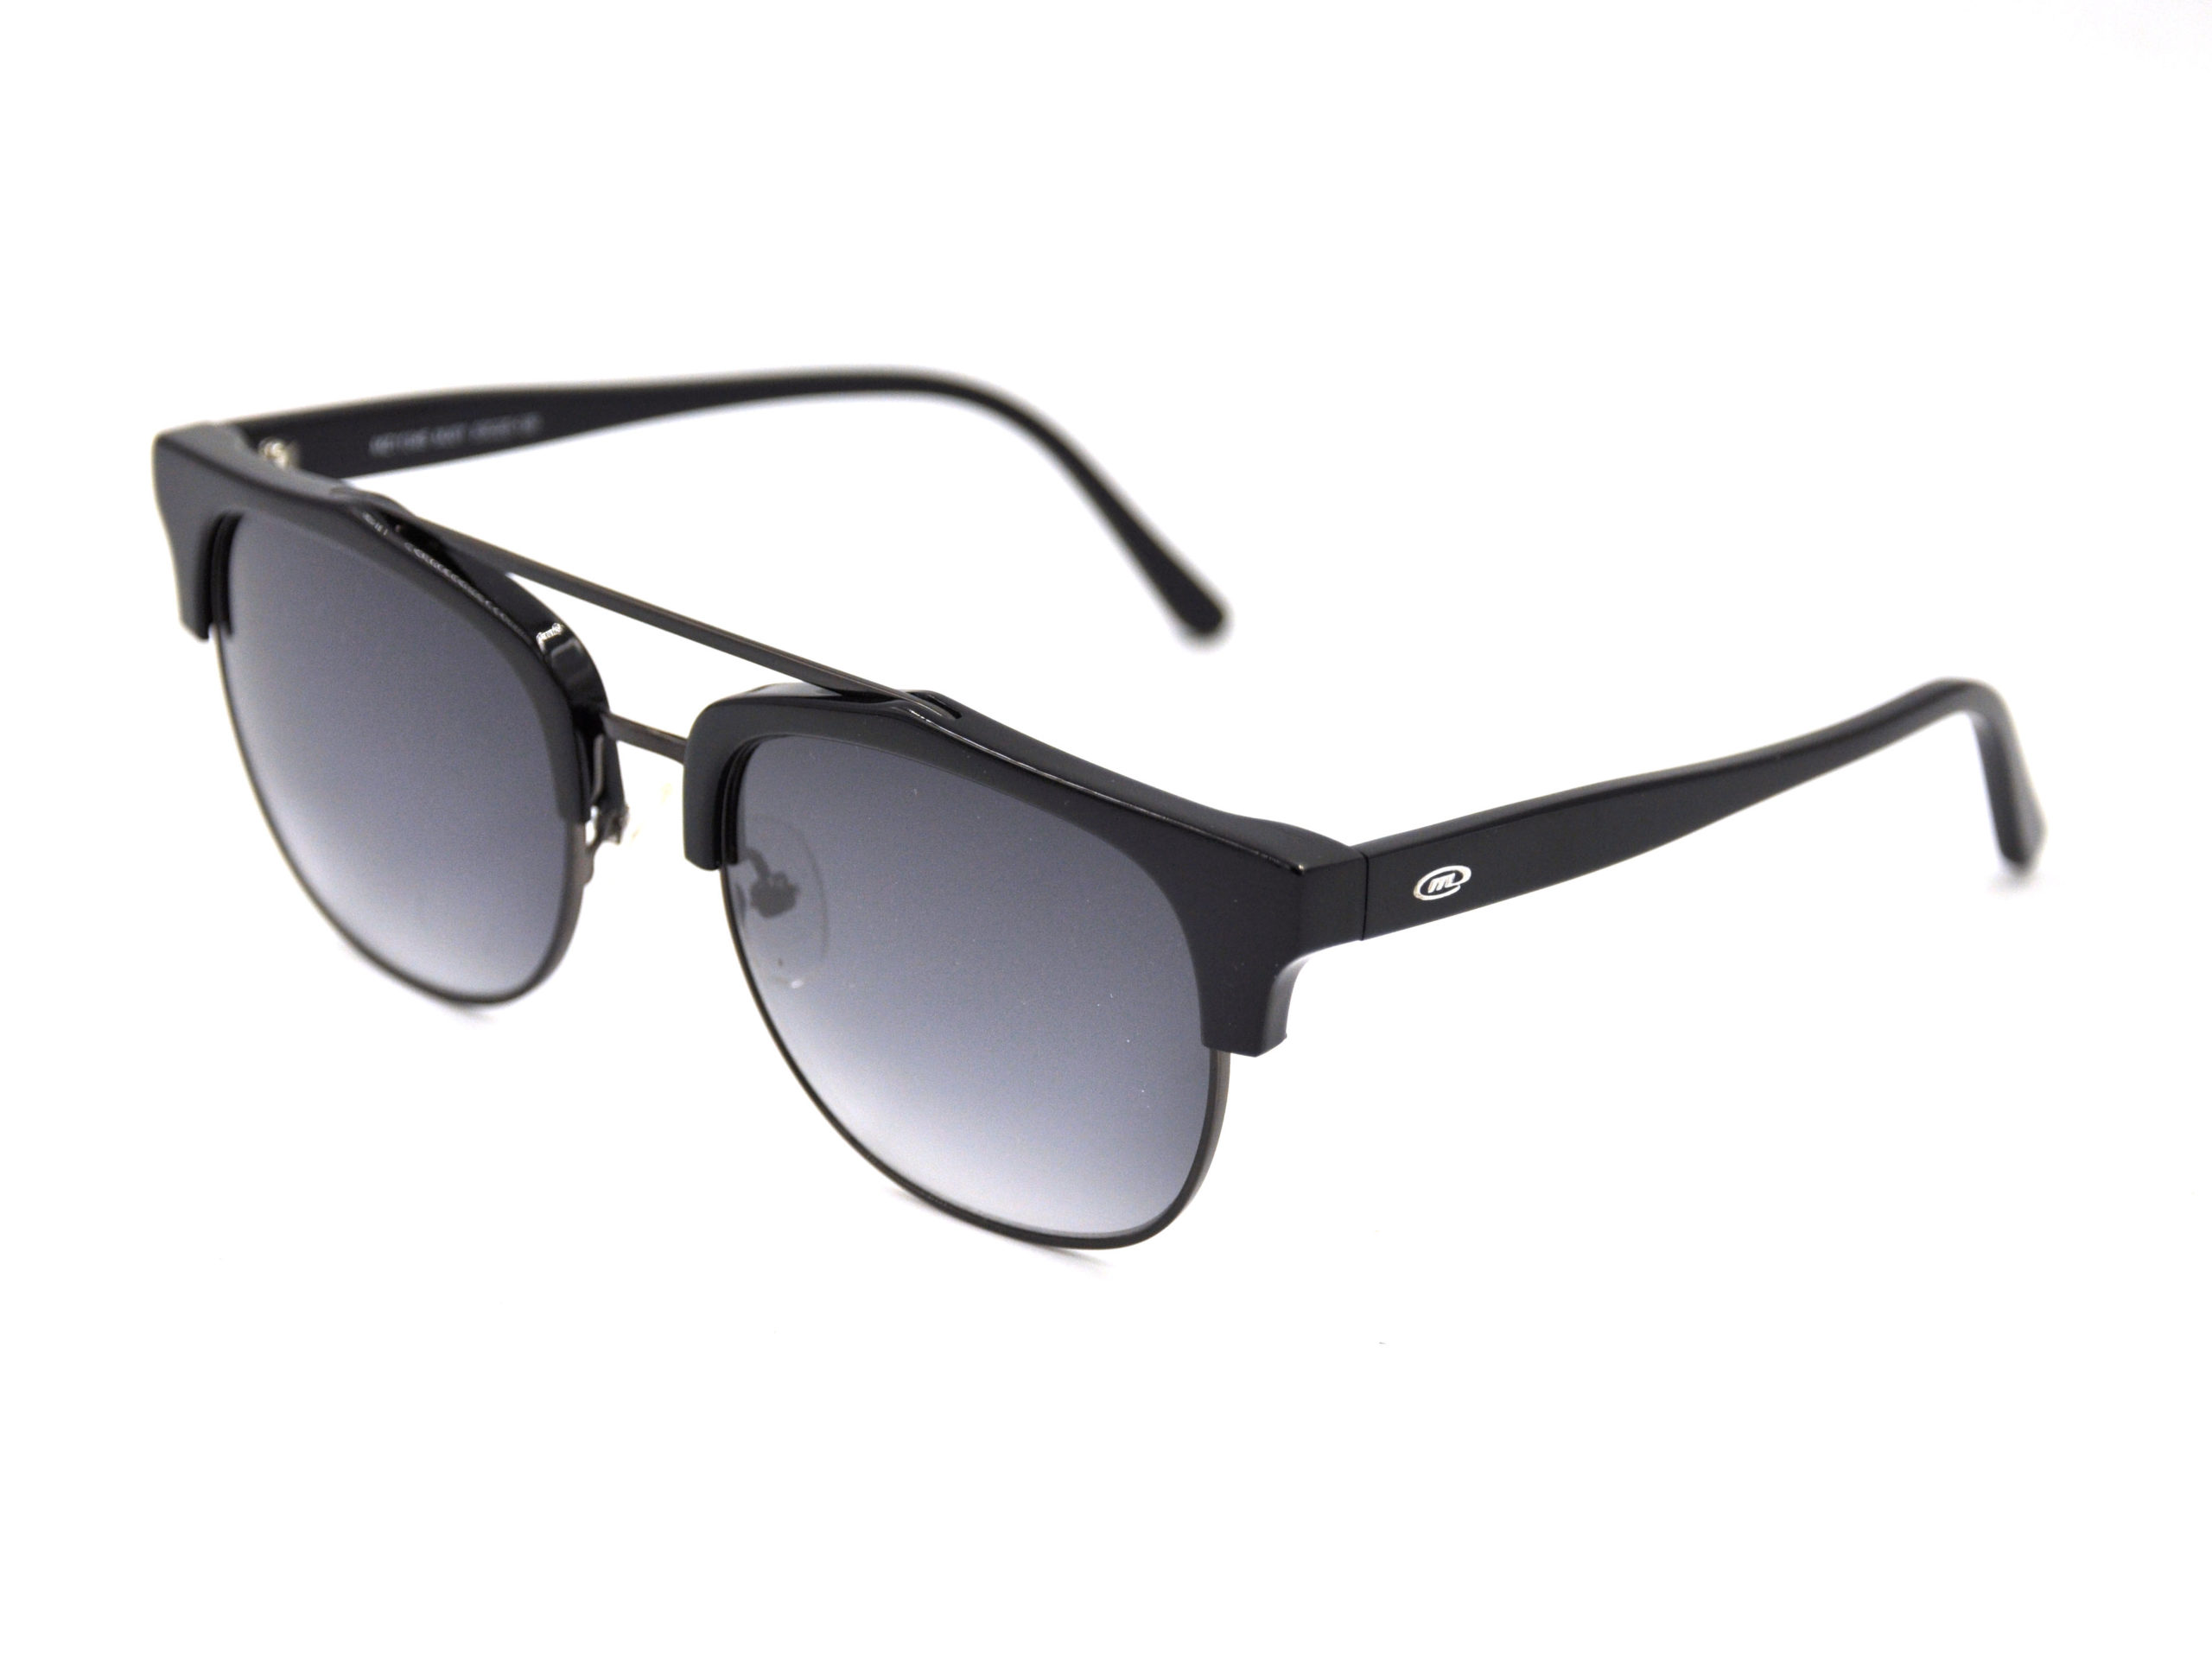 Moritz MZ11345 MJ01 Sunglasses 2020